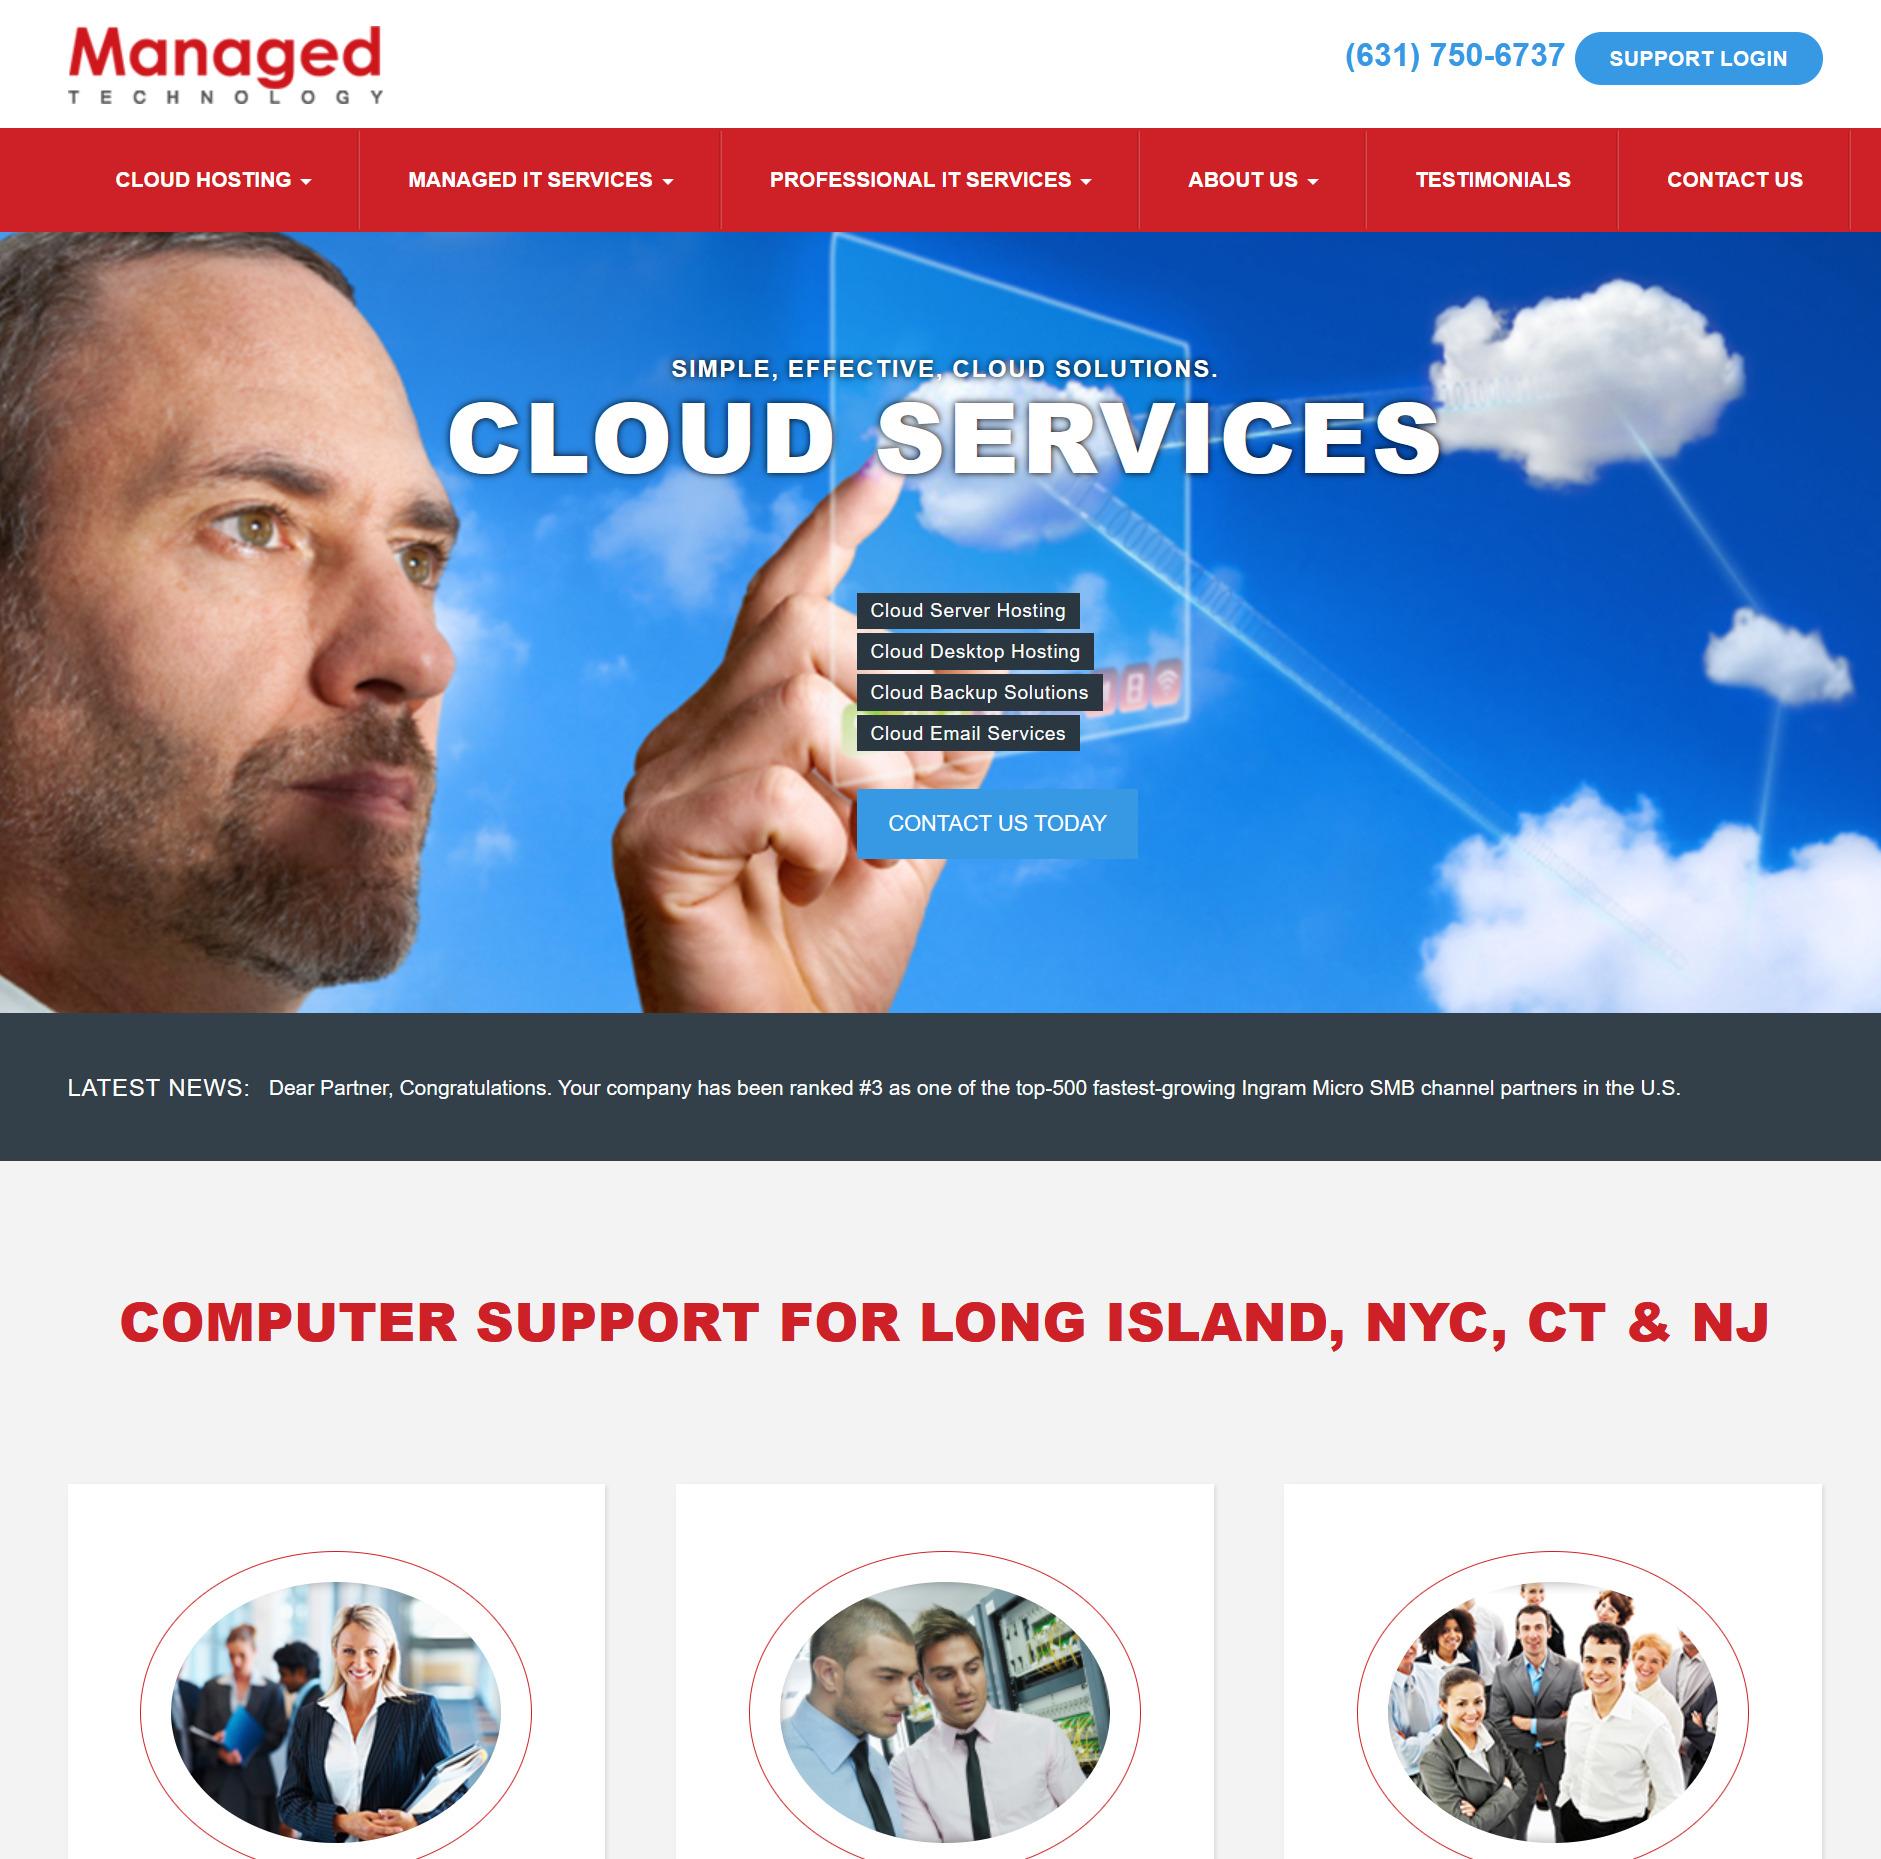 Managed Technology - Information Technology Management